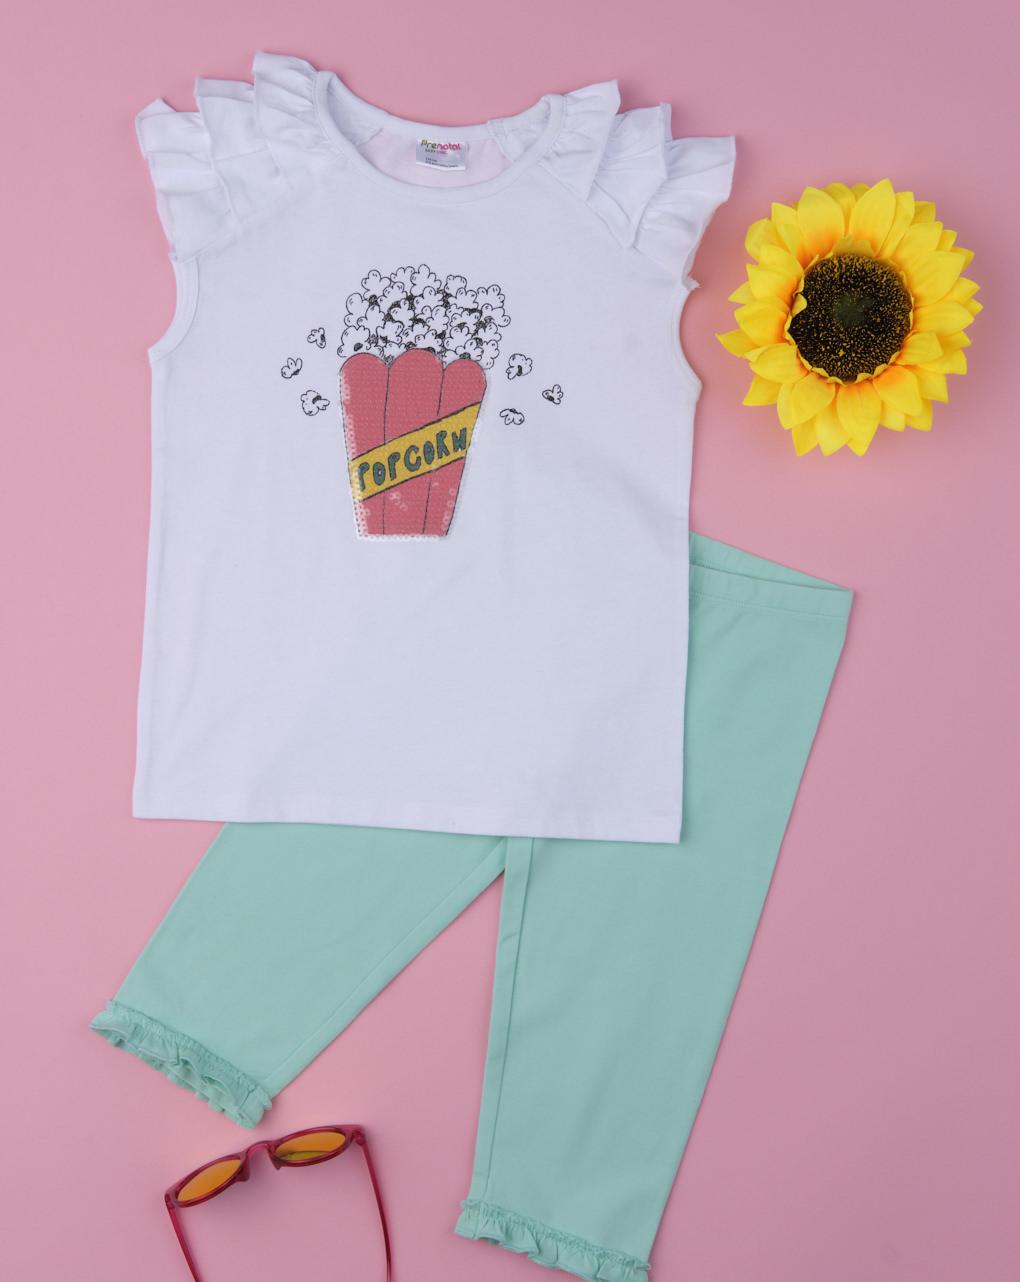 "Completo girl ""pop corn"" - Prénatal"